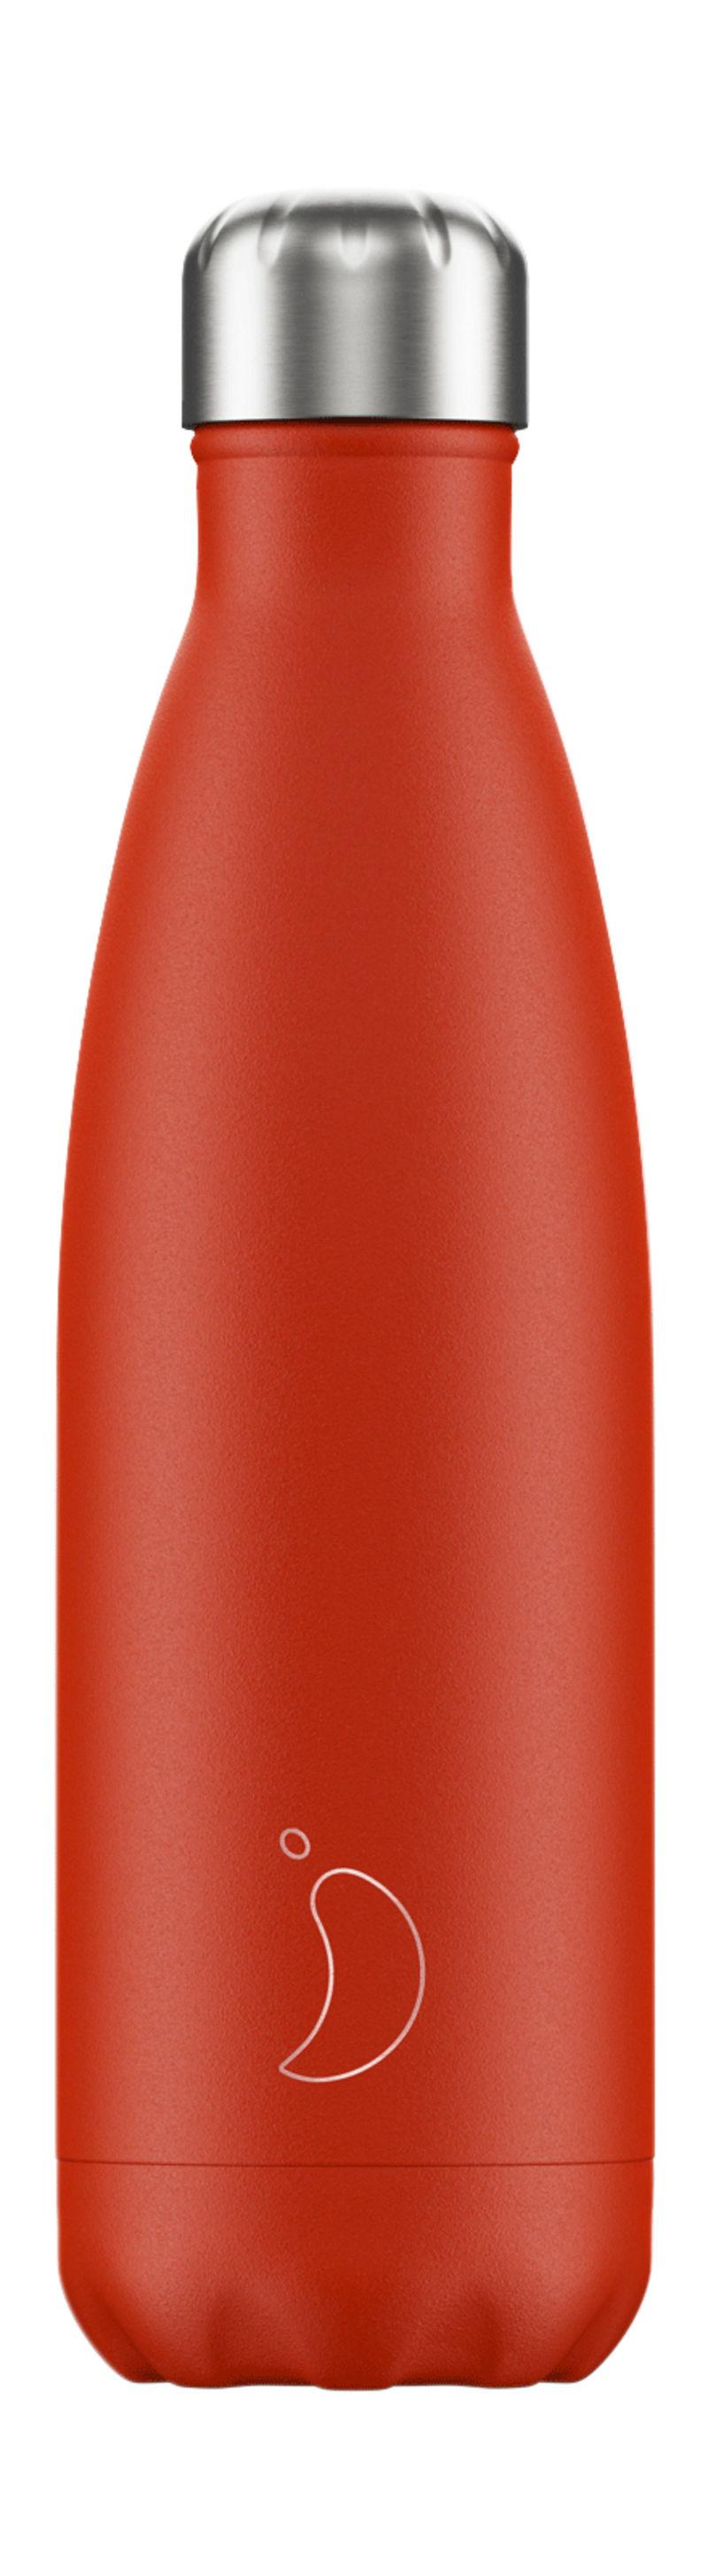 Botella Inox Rojo Neon 500ml -